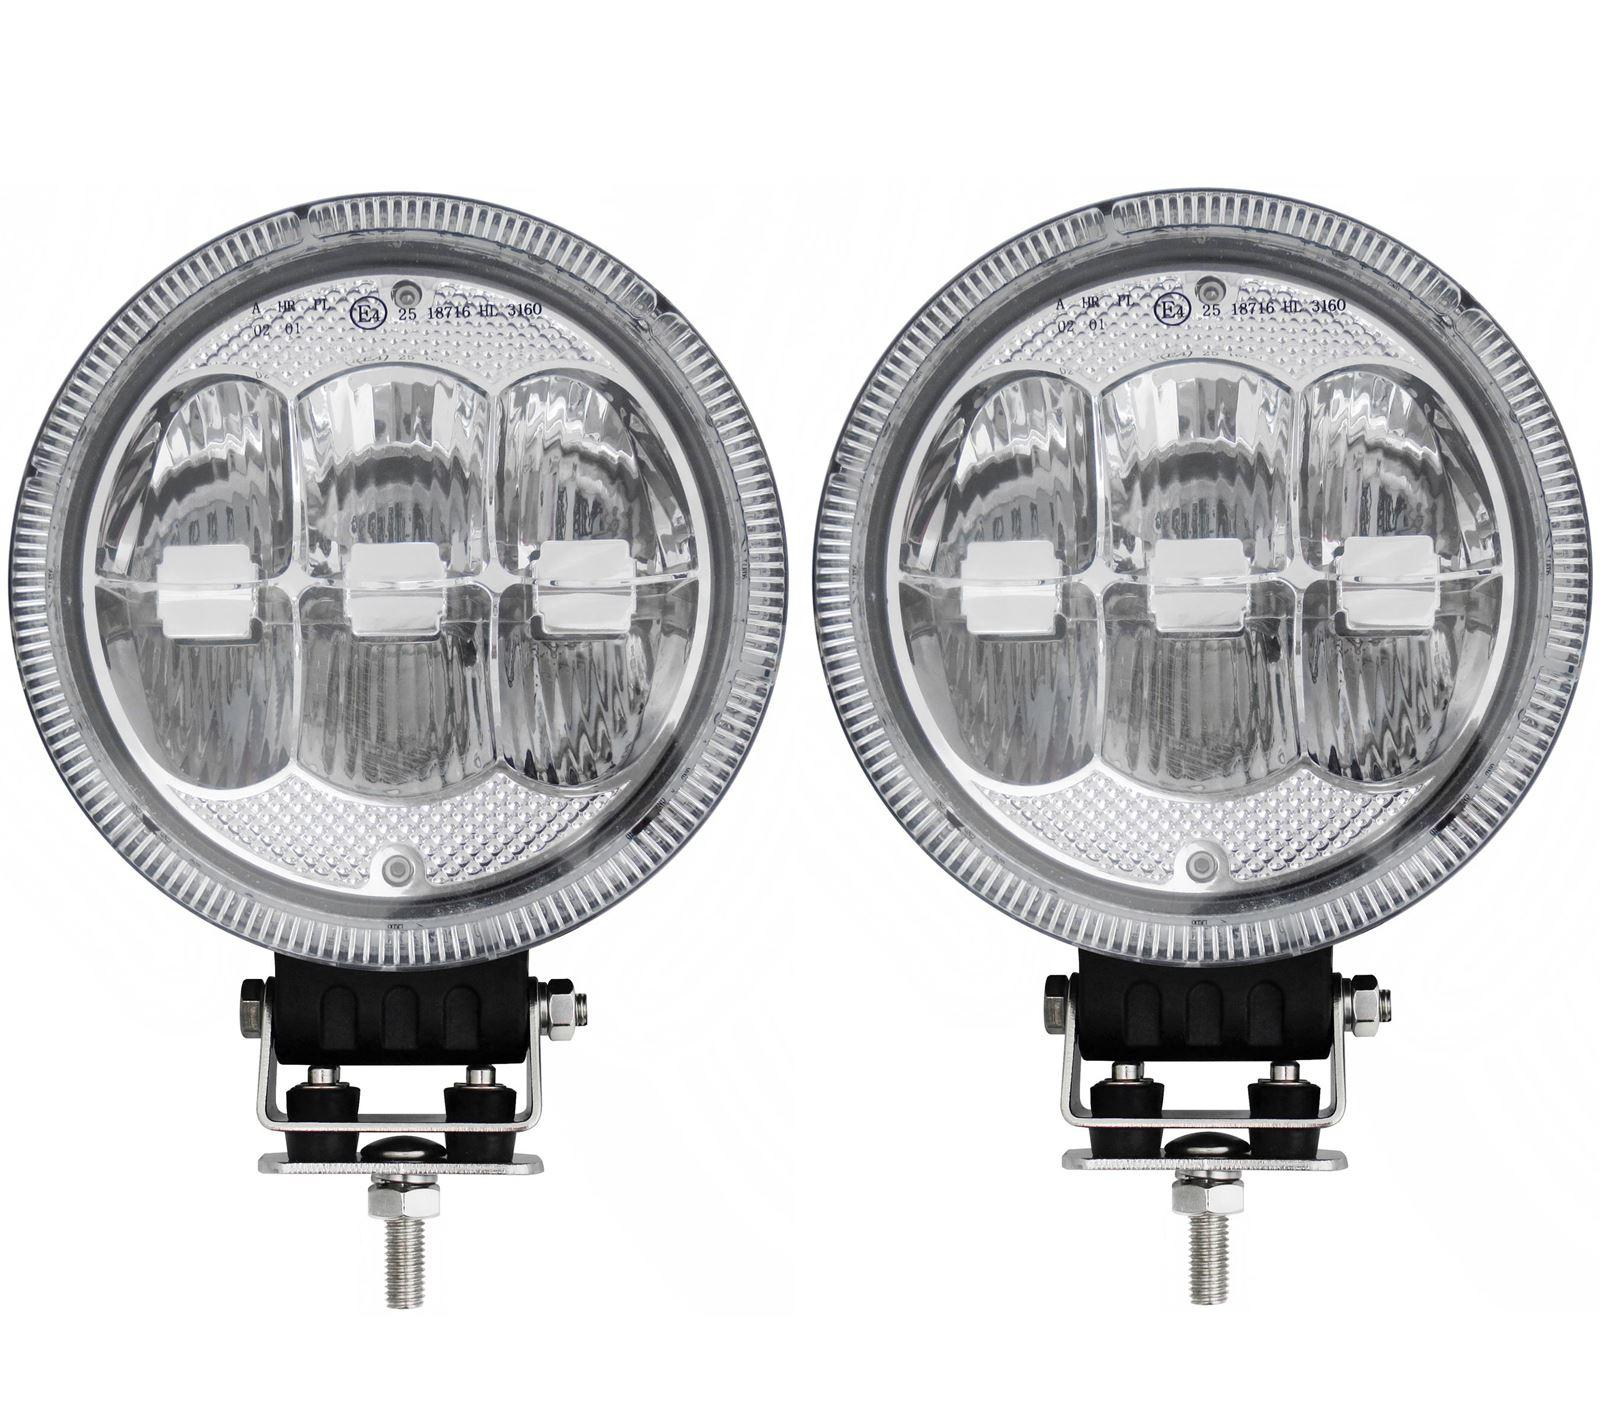 scene utility light work rf sale vehicle round led image for lights